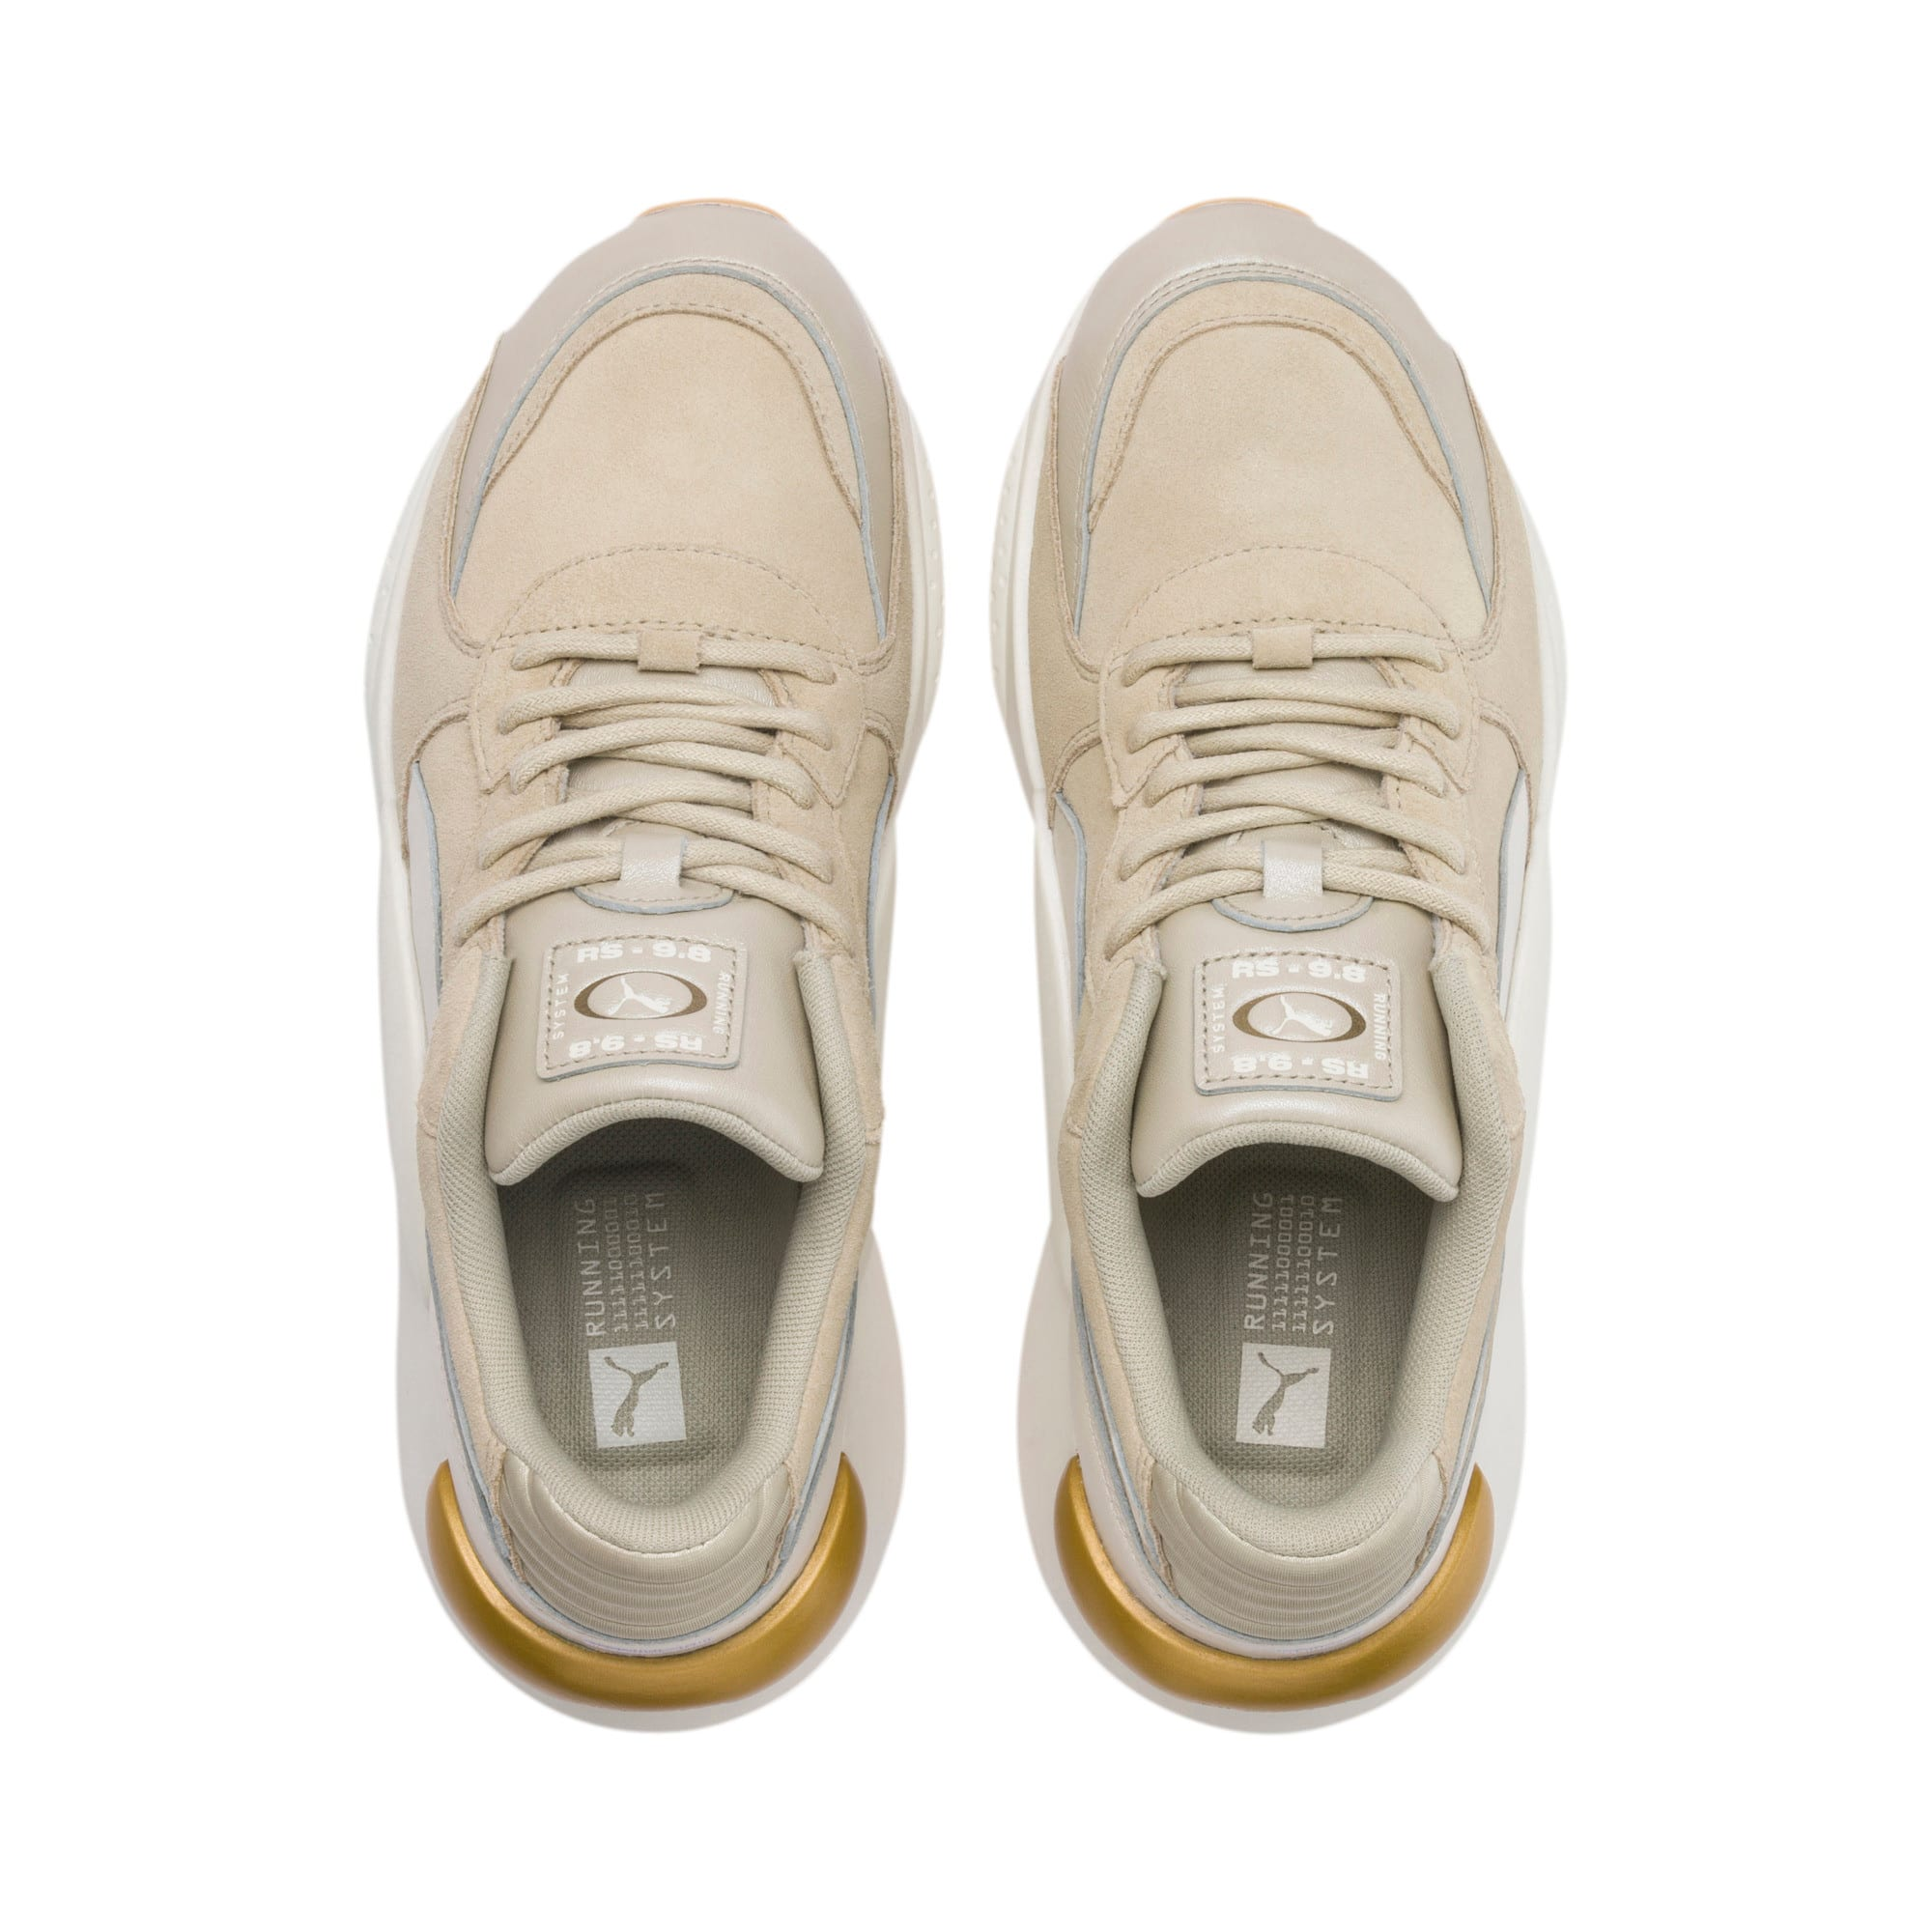 Thumbnail 7 of RS 9.8 Metallic Women's Sneakers, Overcast, medium